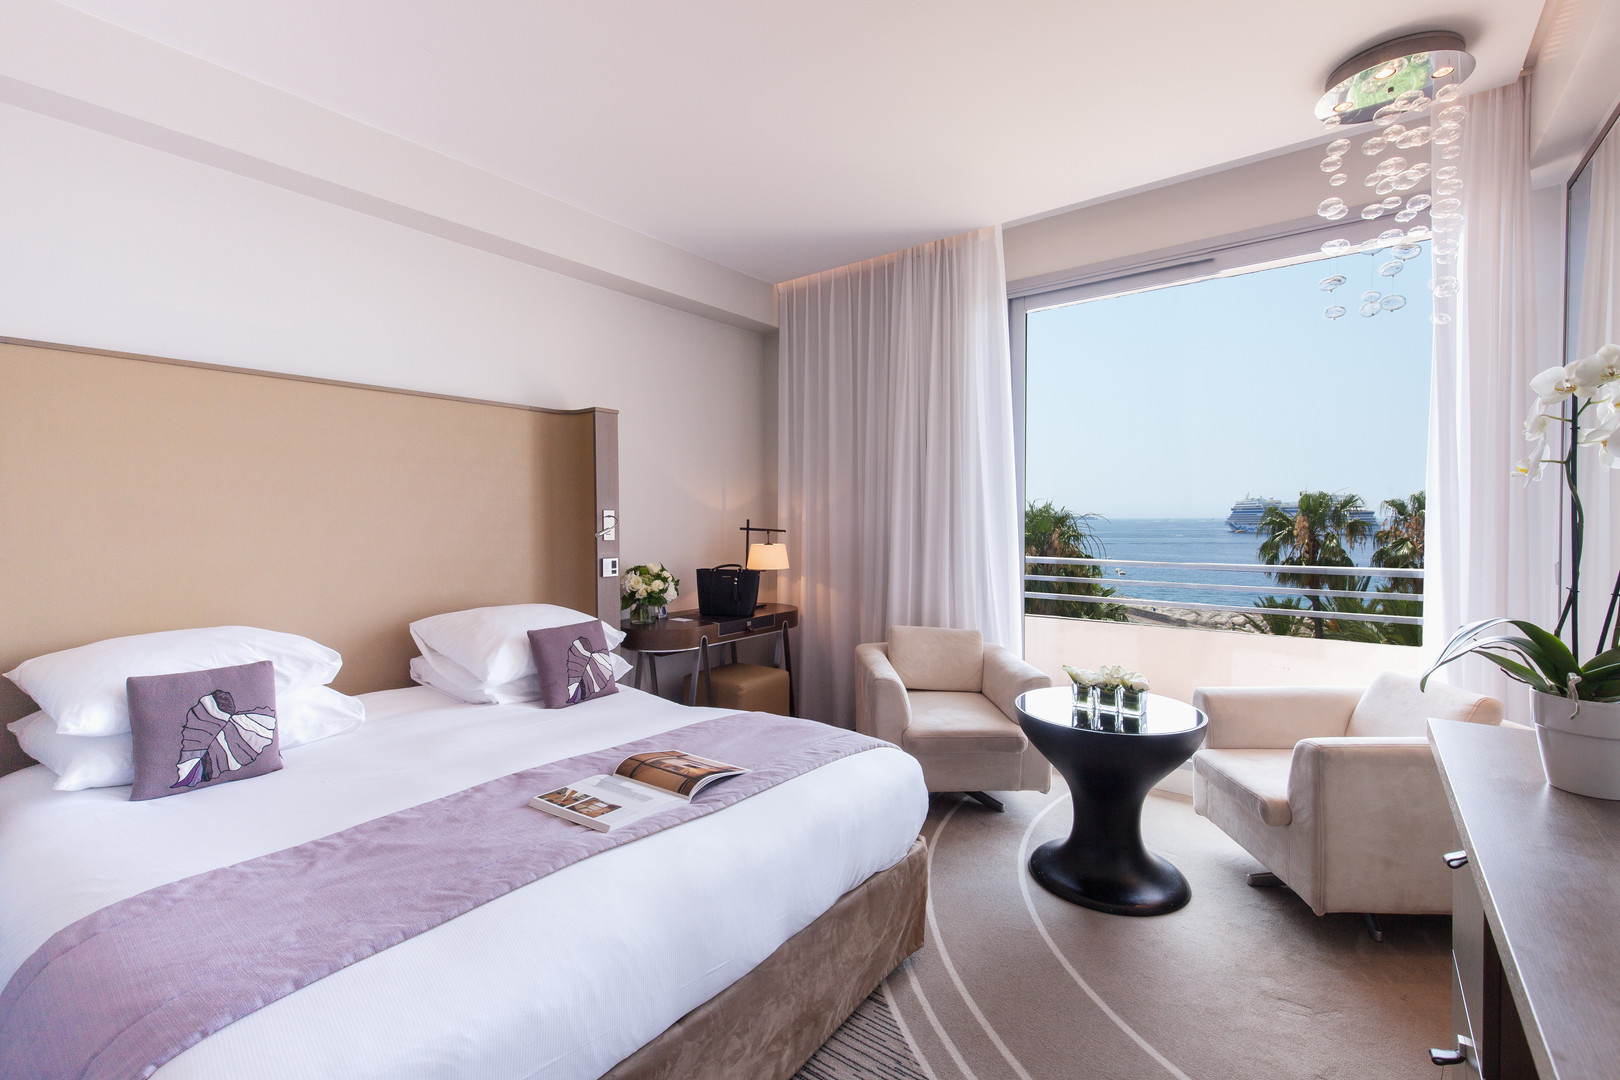 Radisson Blu 1835 Hotel & Thalasso - Deluxe Vue Mer